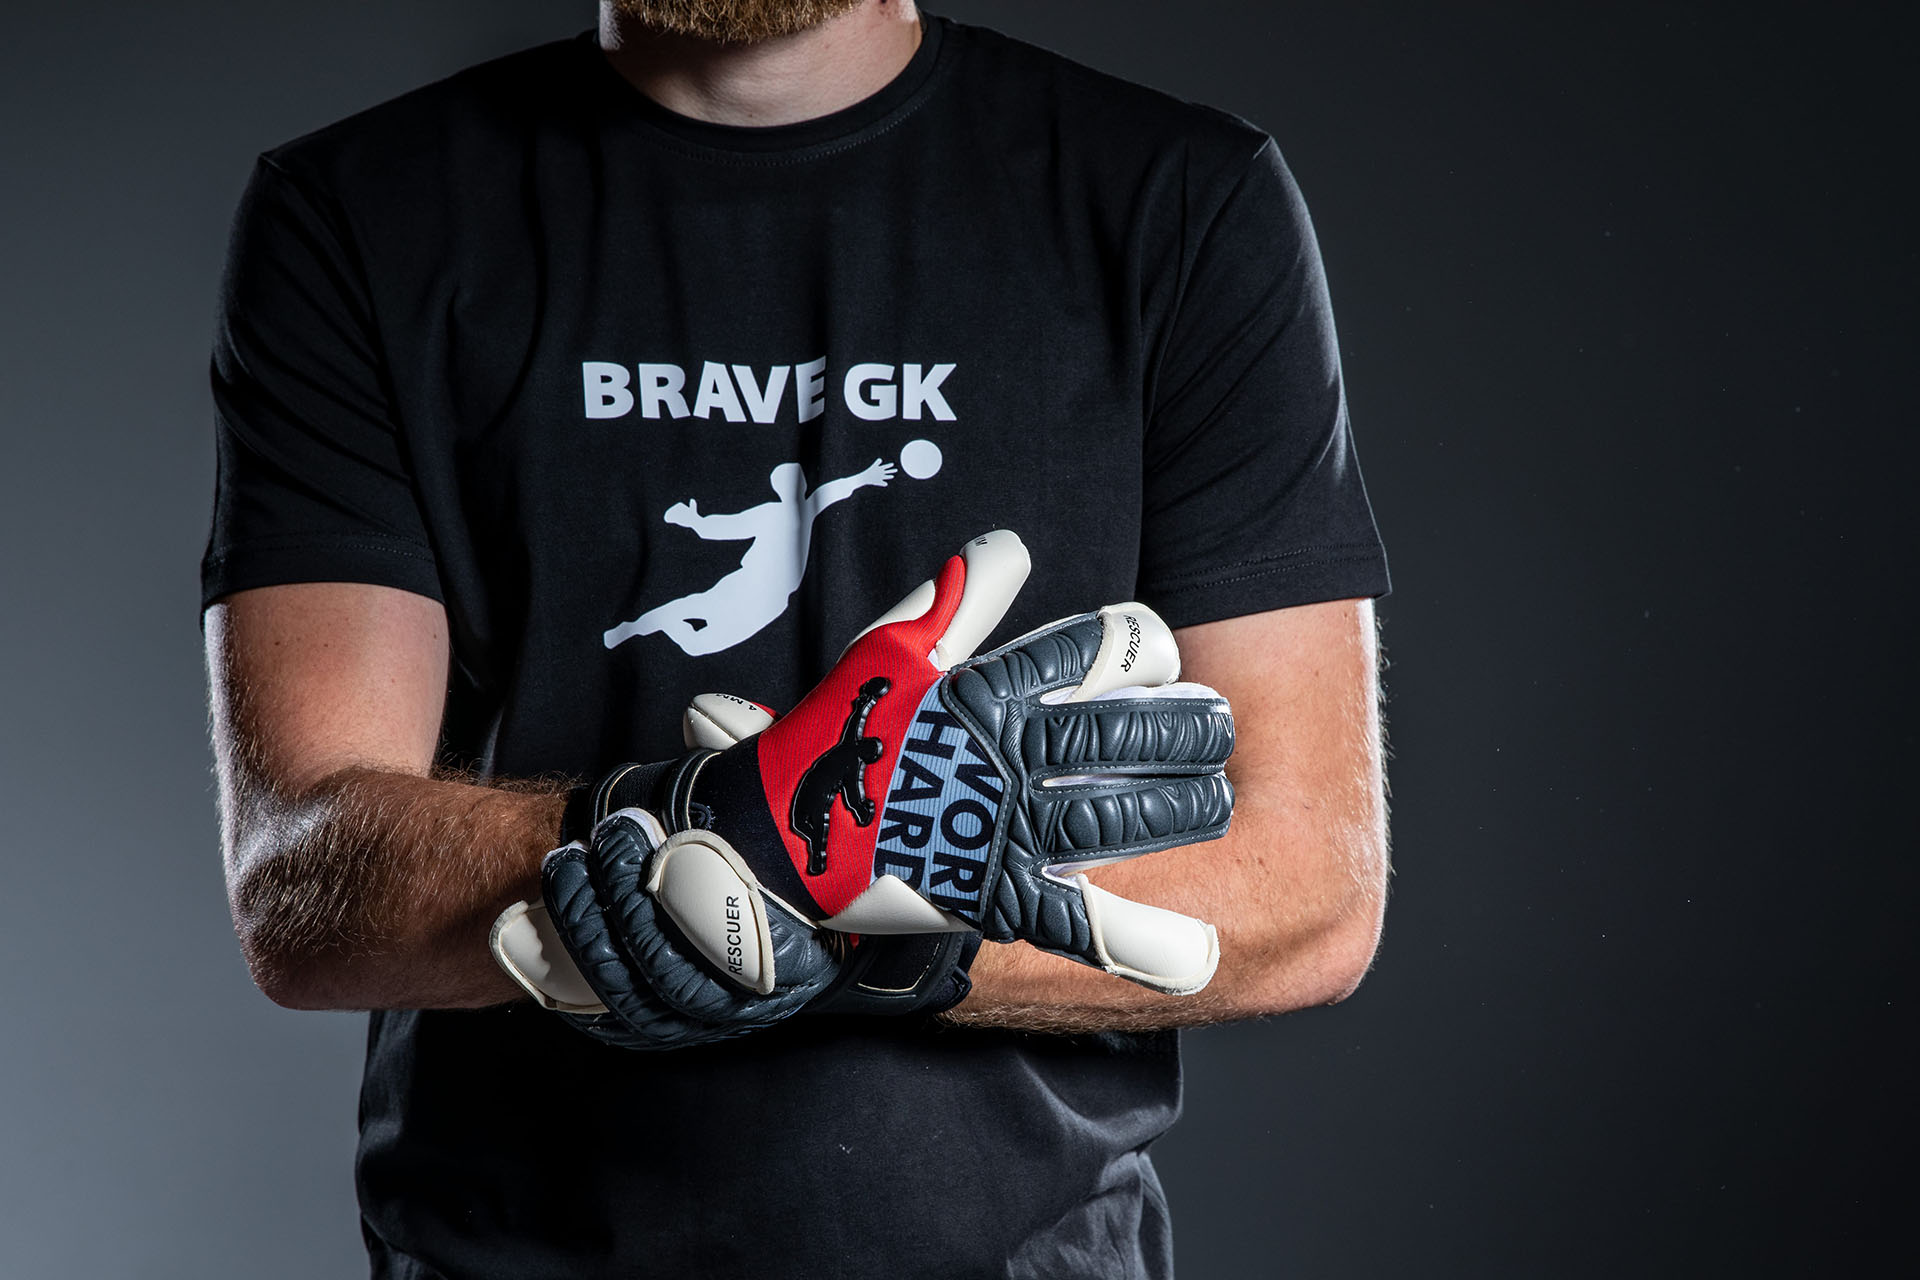 Brave GK Rescuer Work Hard - официальный интернет-магазин Brave GK